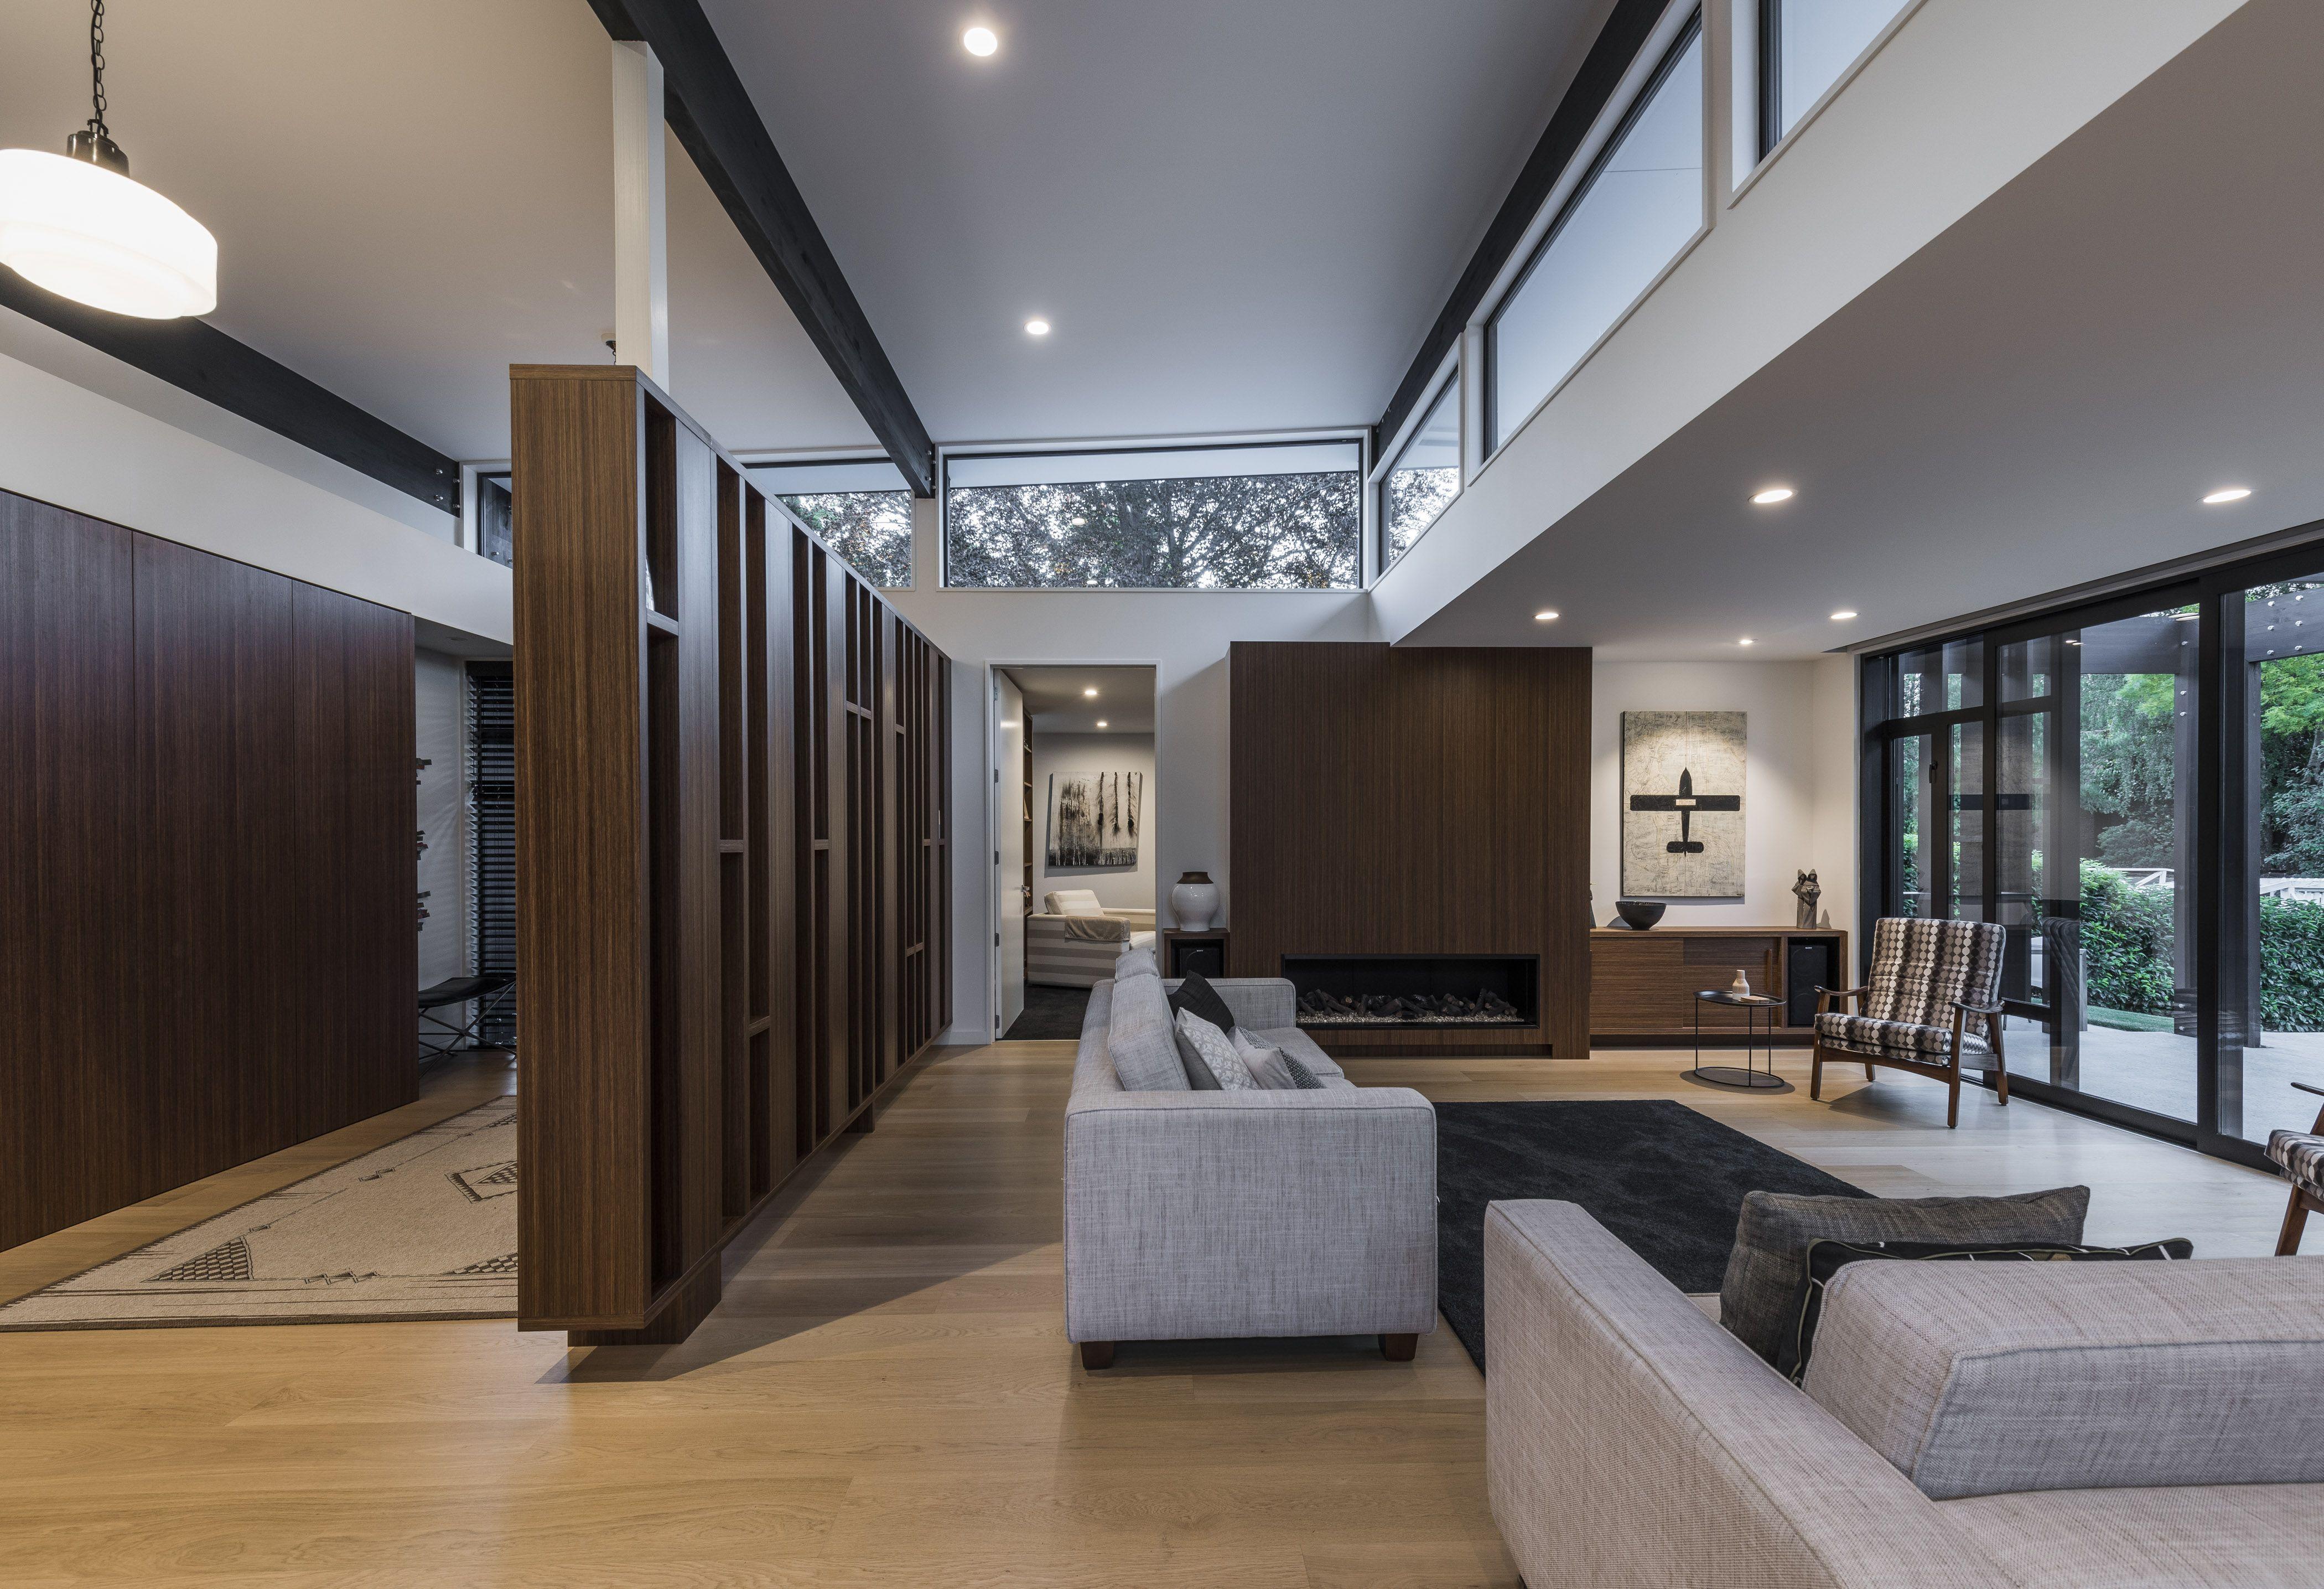 A luxury living room designed by don roy cymon allfrey from cymon alfrey architects ltd livingroom adnz architecture